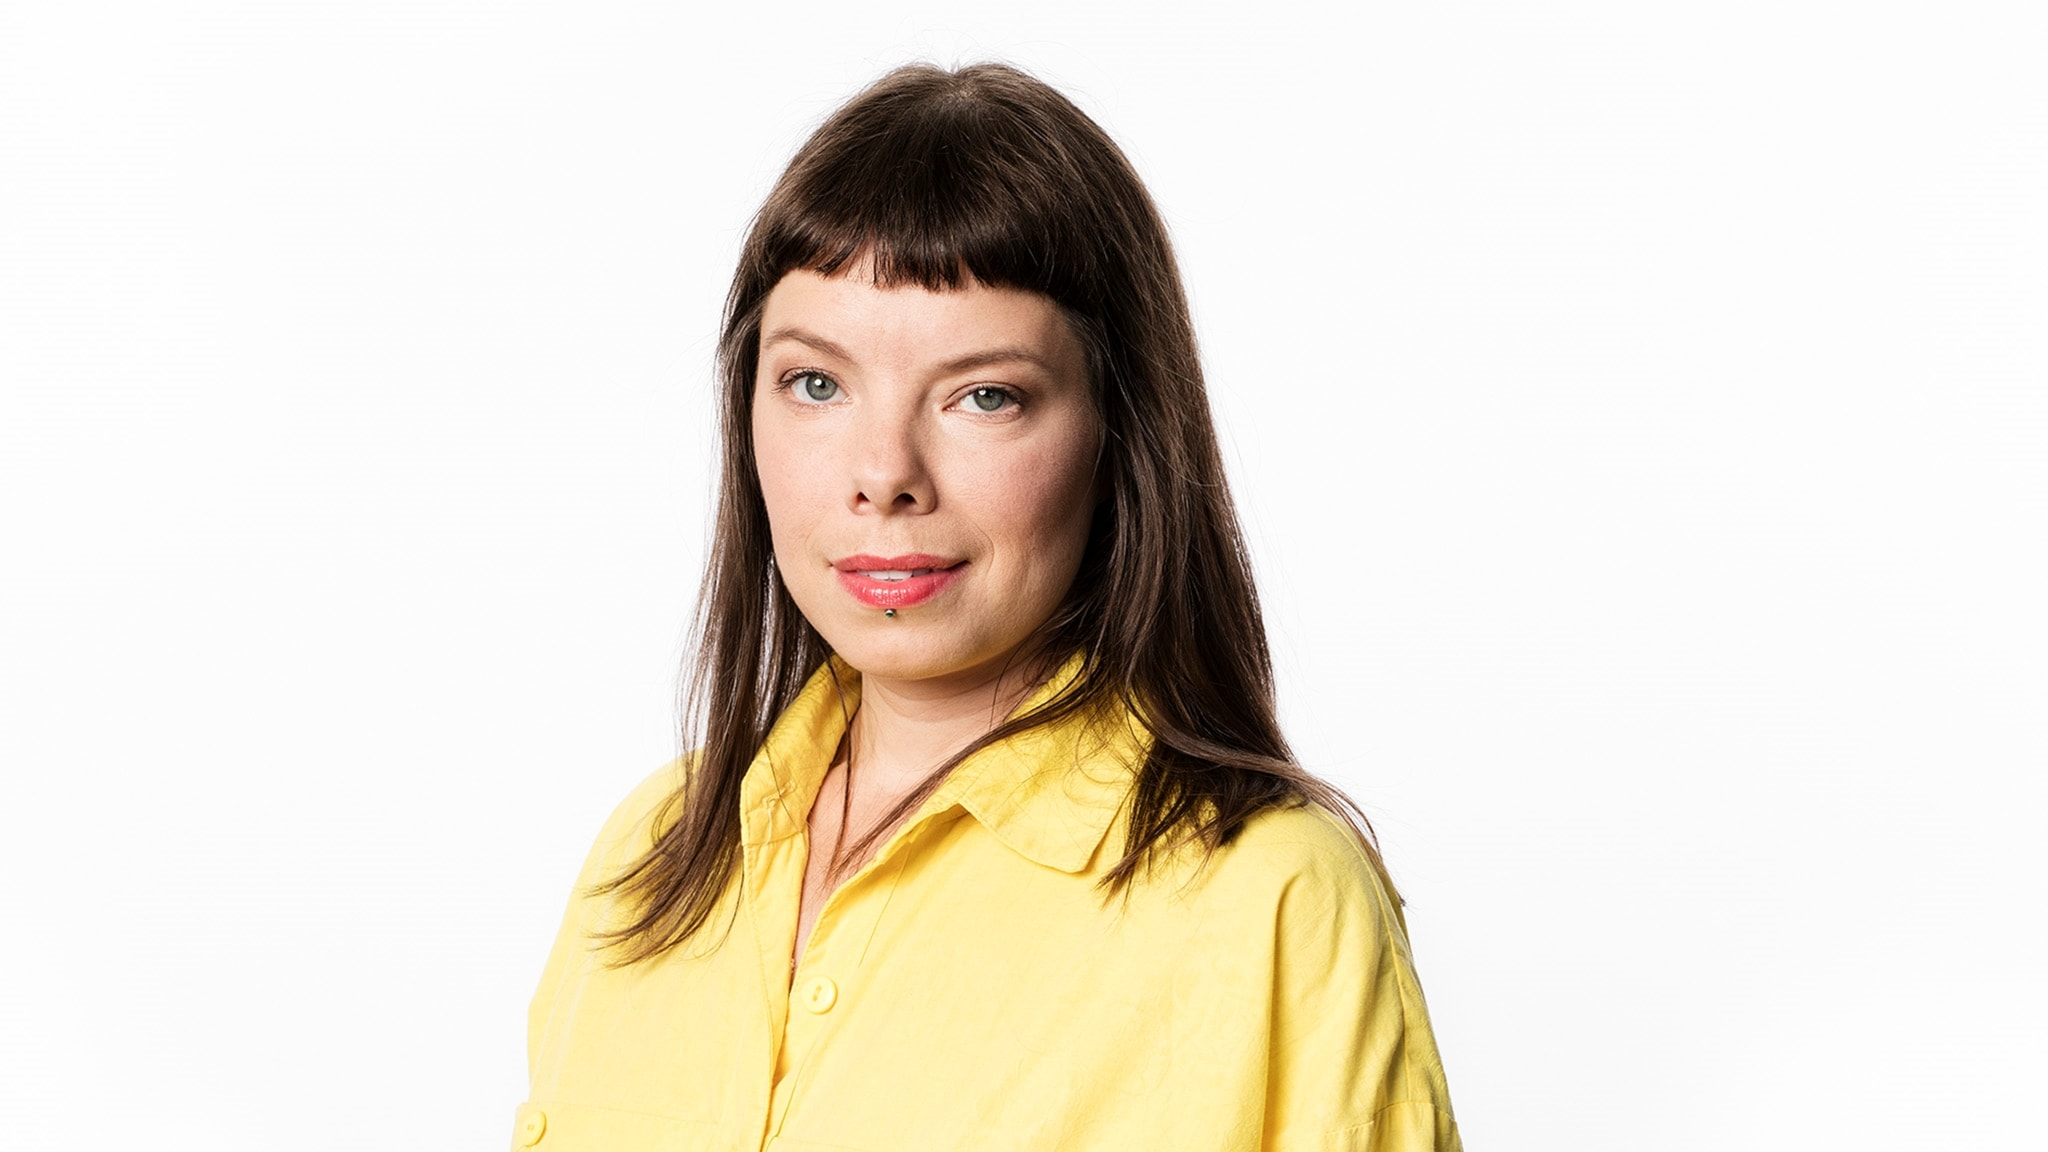 Thella Johnson. Sveriges Radios korrespondent i Helsingfors. Ekot Sveriges Radio.